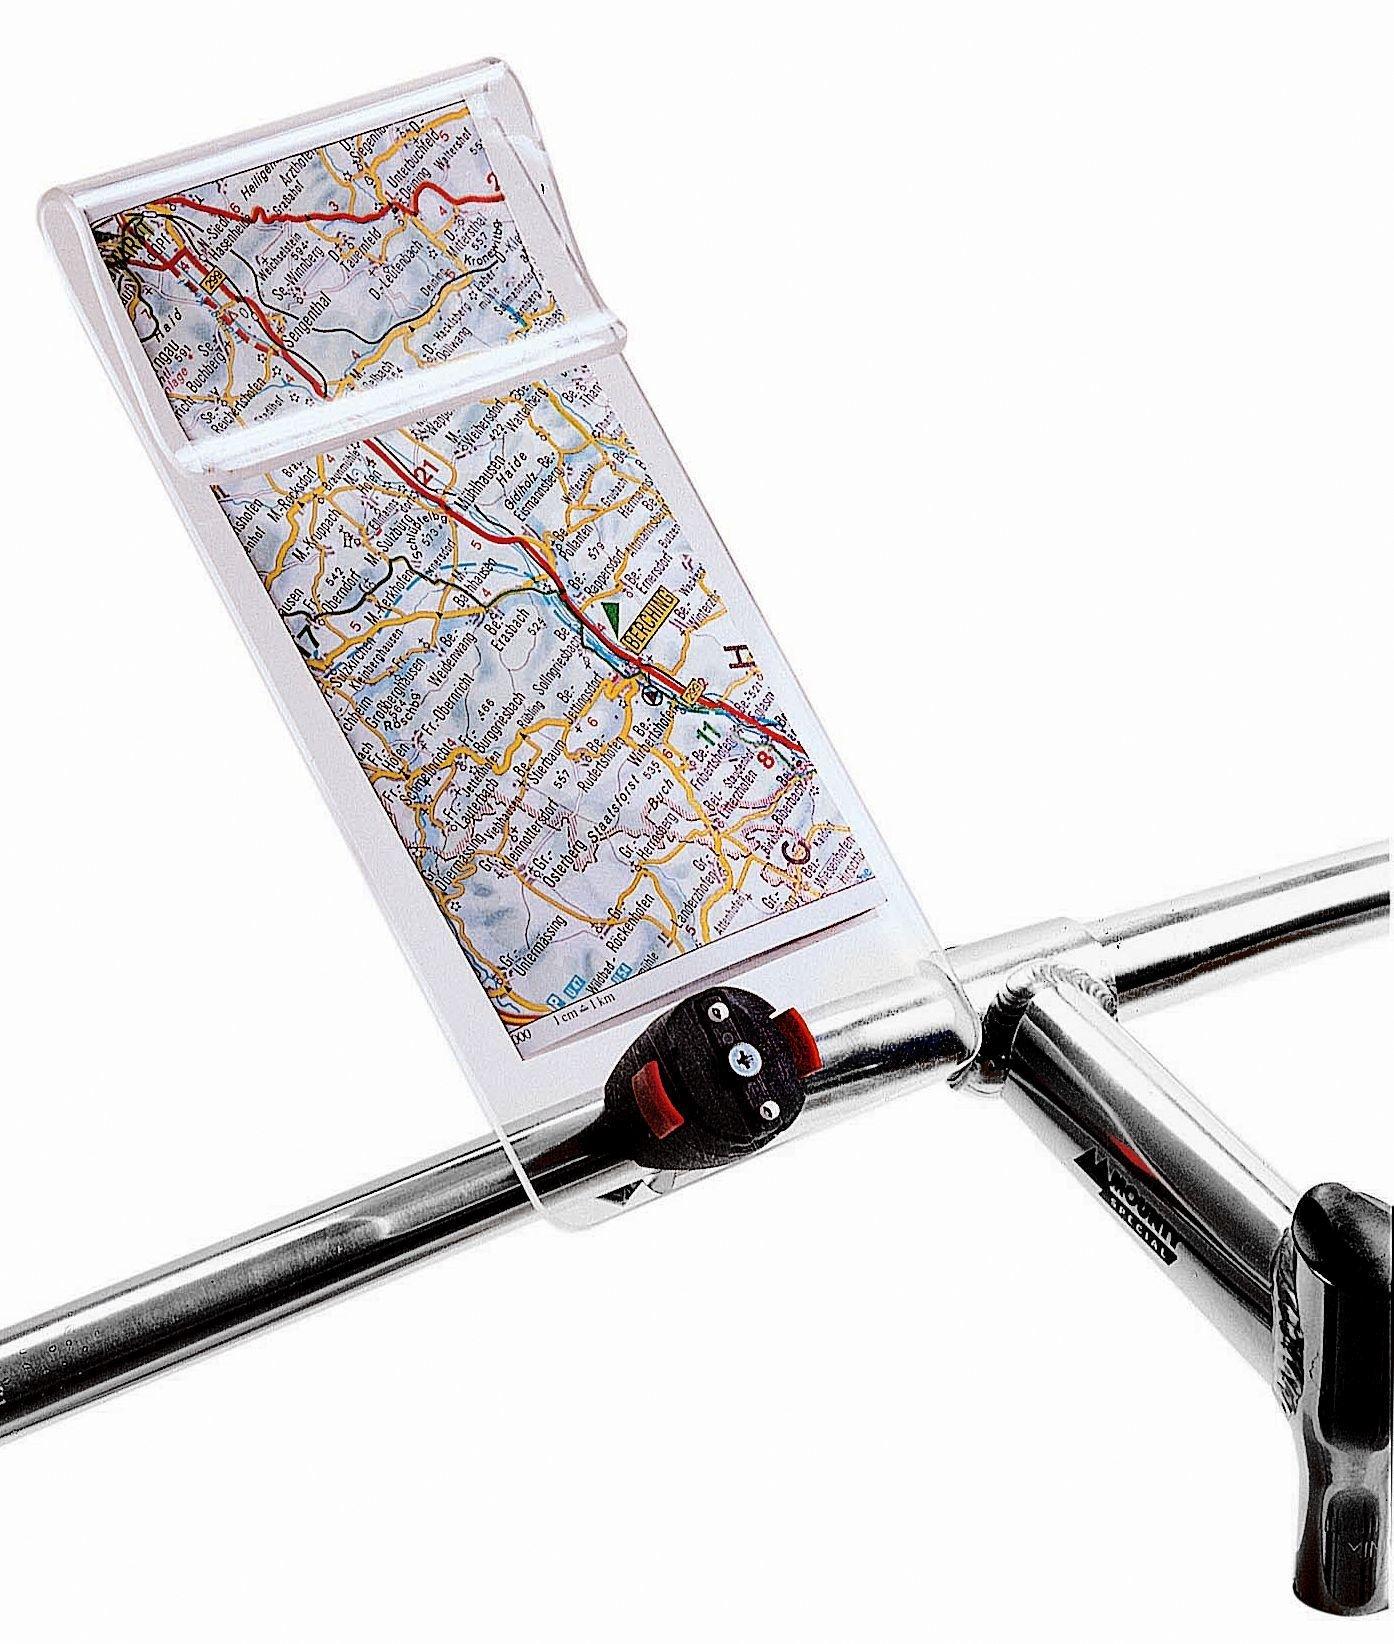 kartenhalter/Lenker: Rixen & Kaul  Mini-Map Mini-Map 1